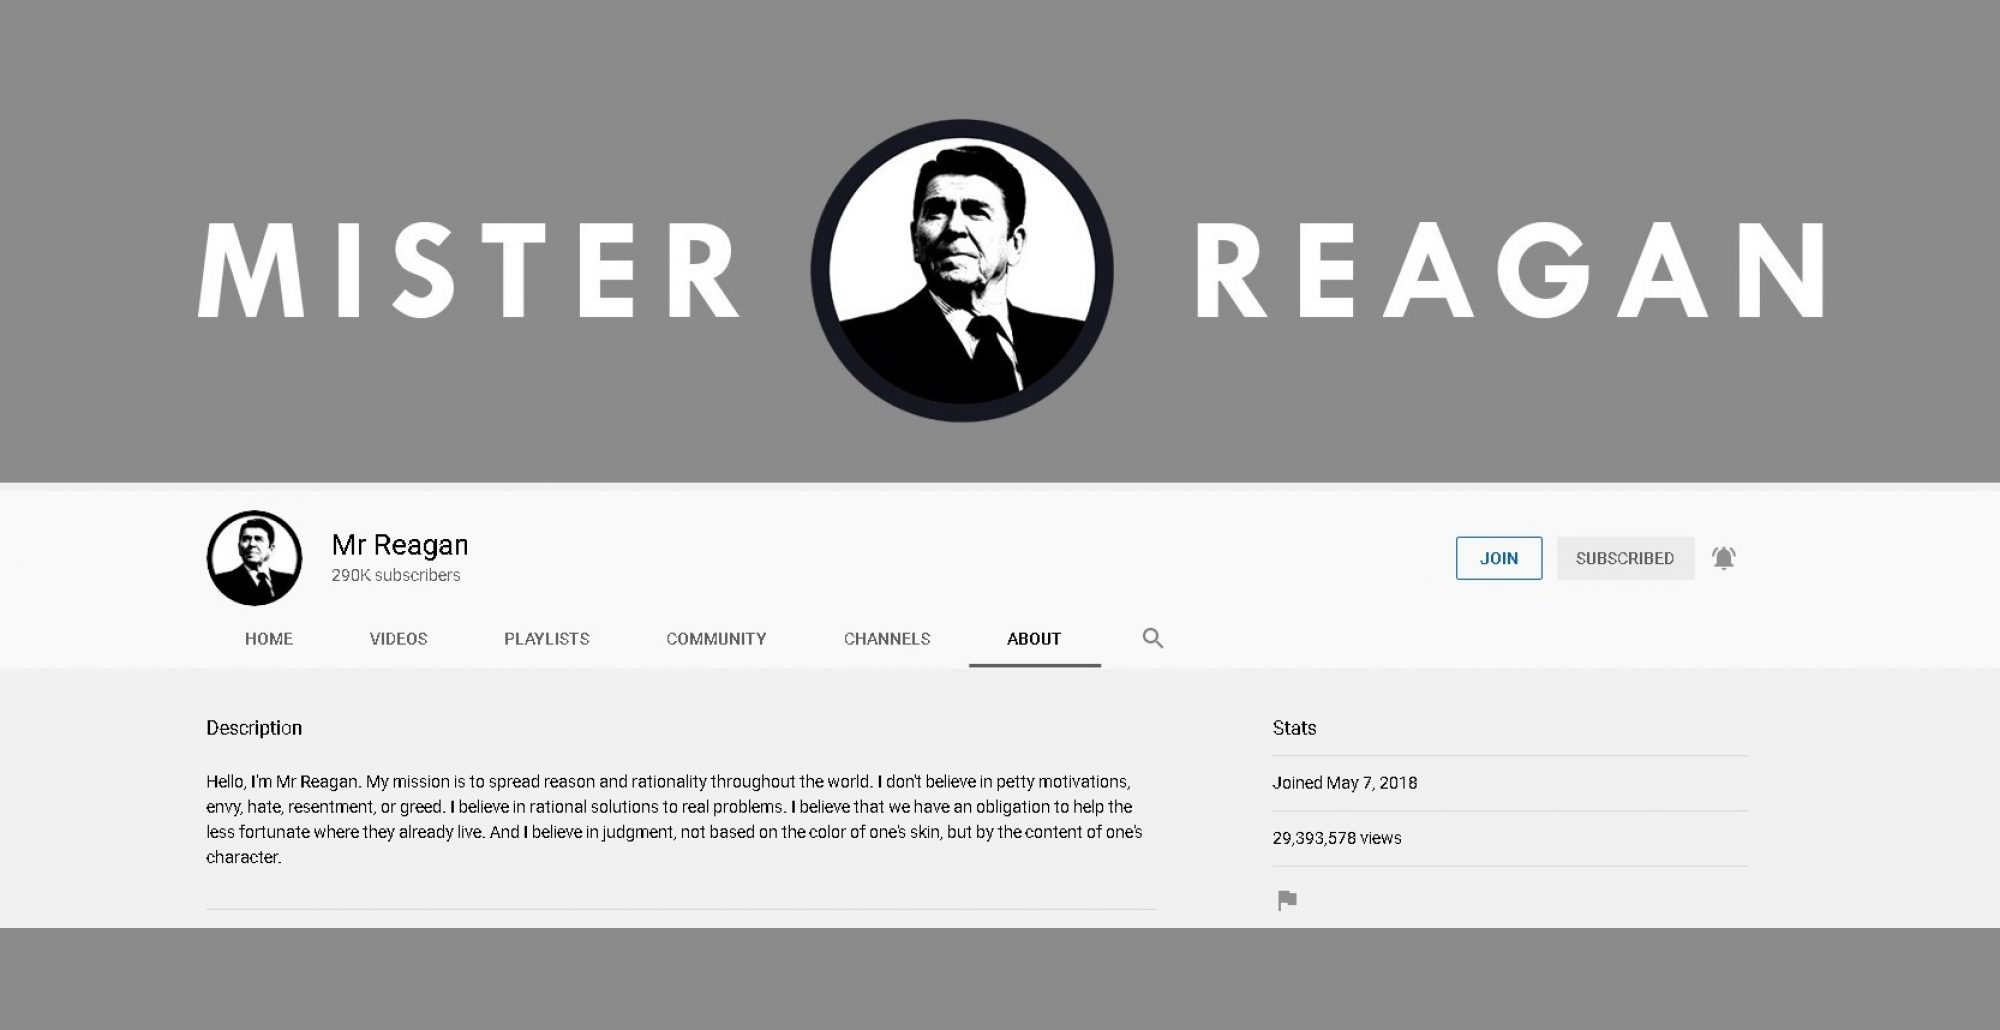 Mr Reagan